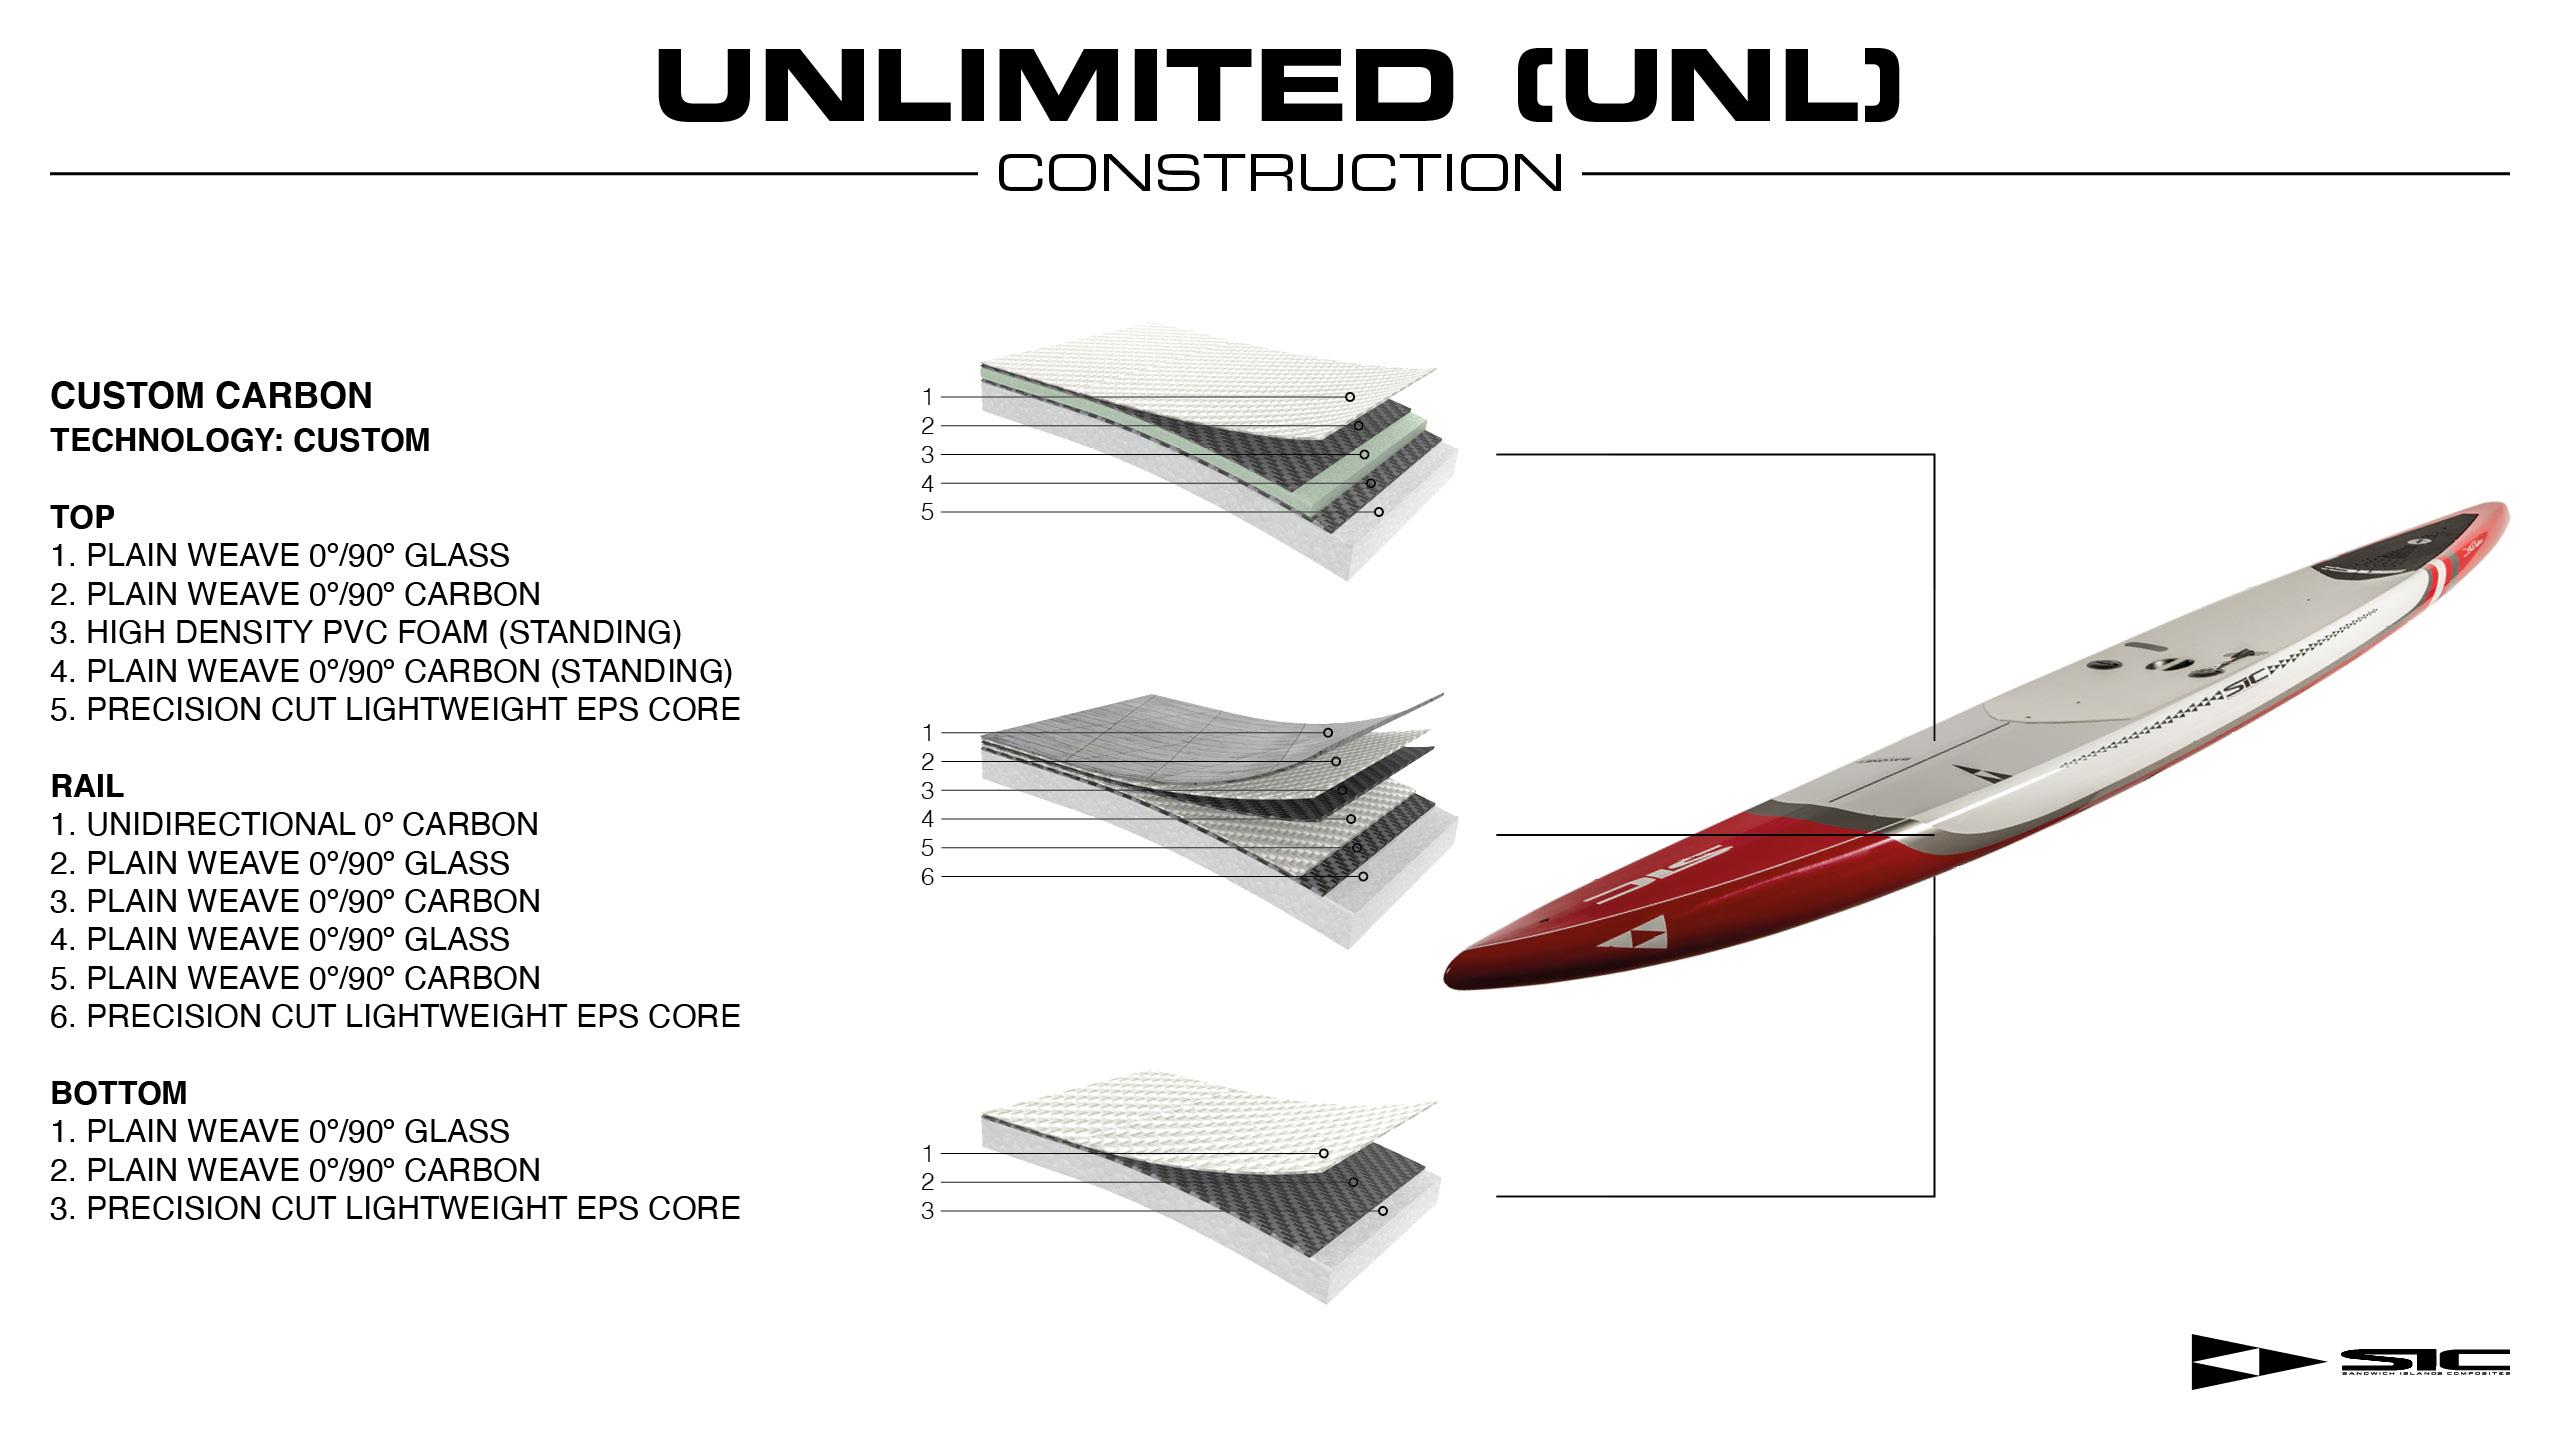 UNLIMITED_UNL___SIC_technology_1__1